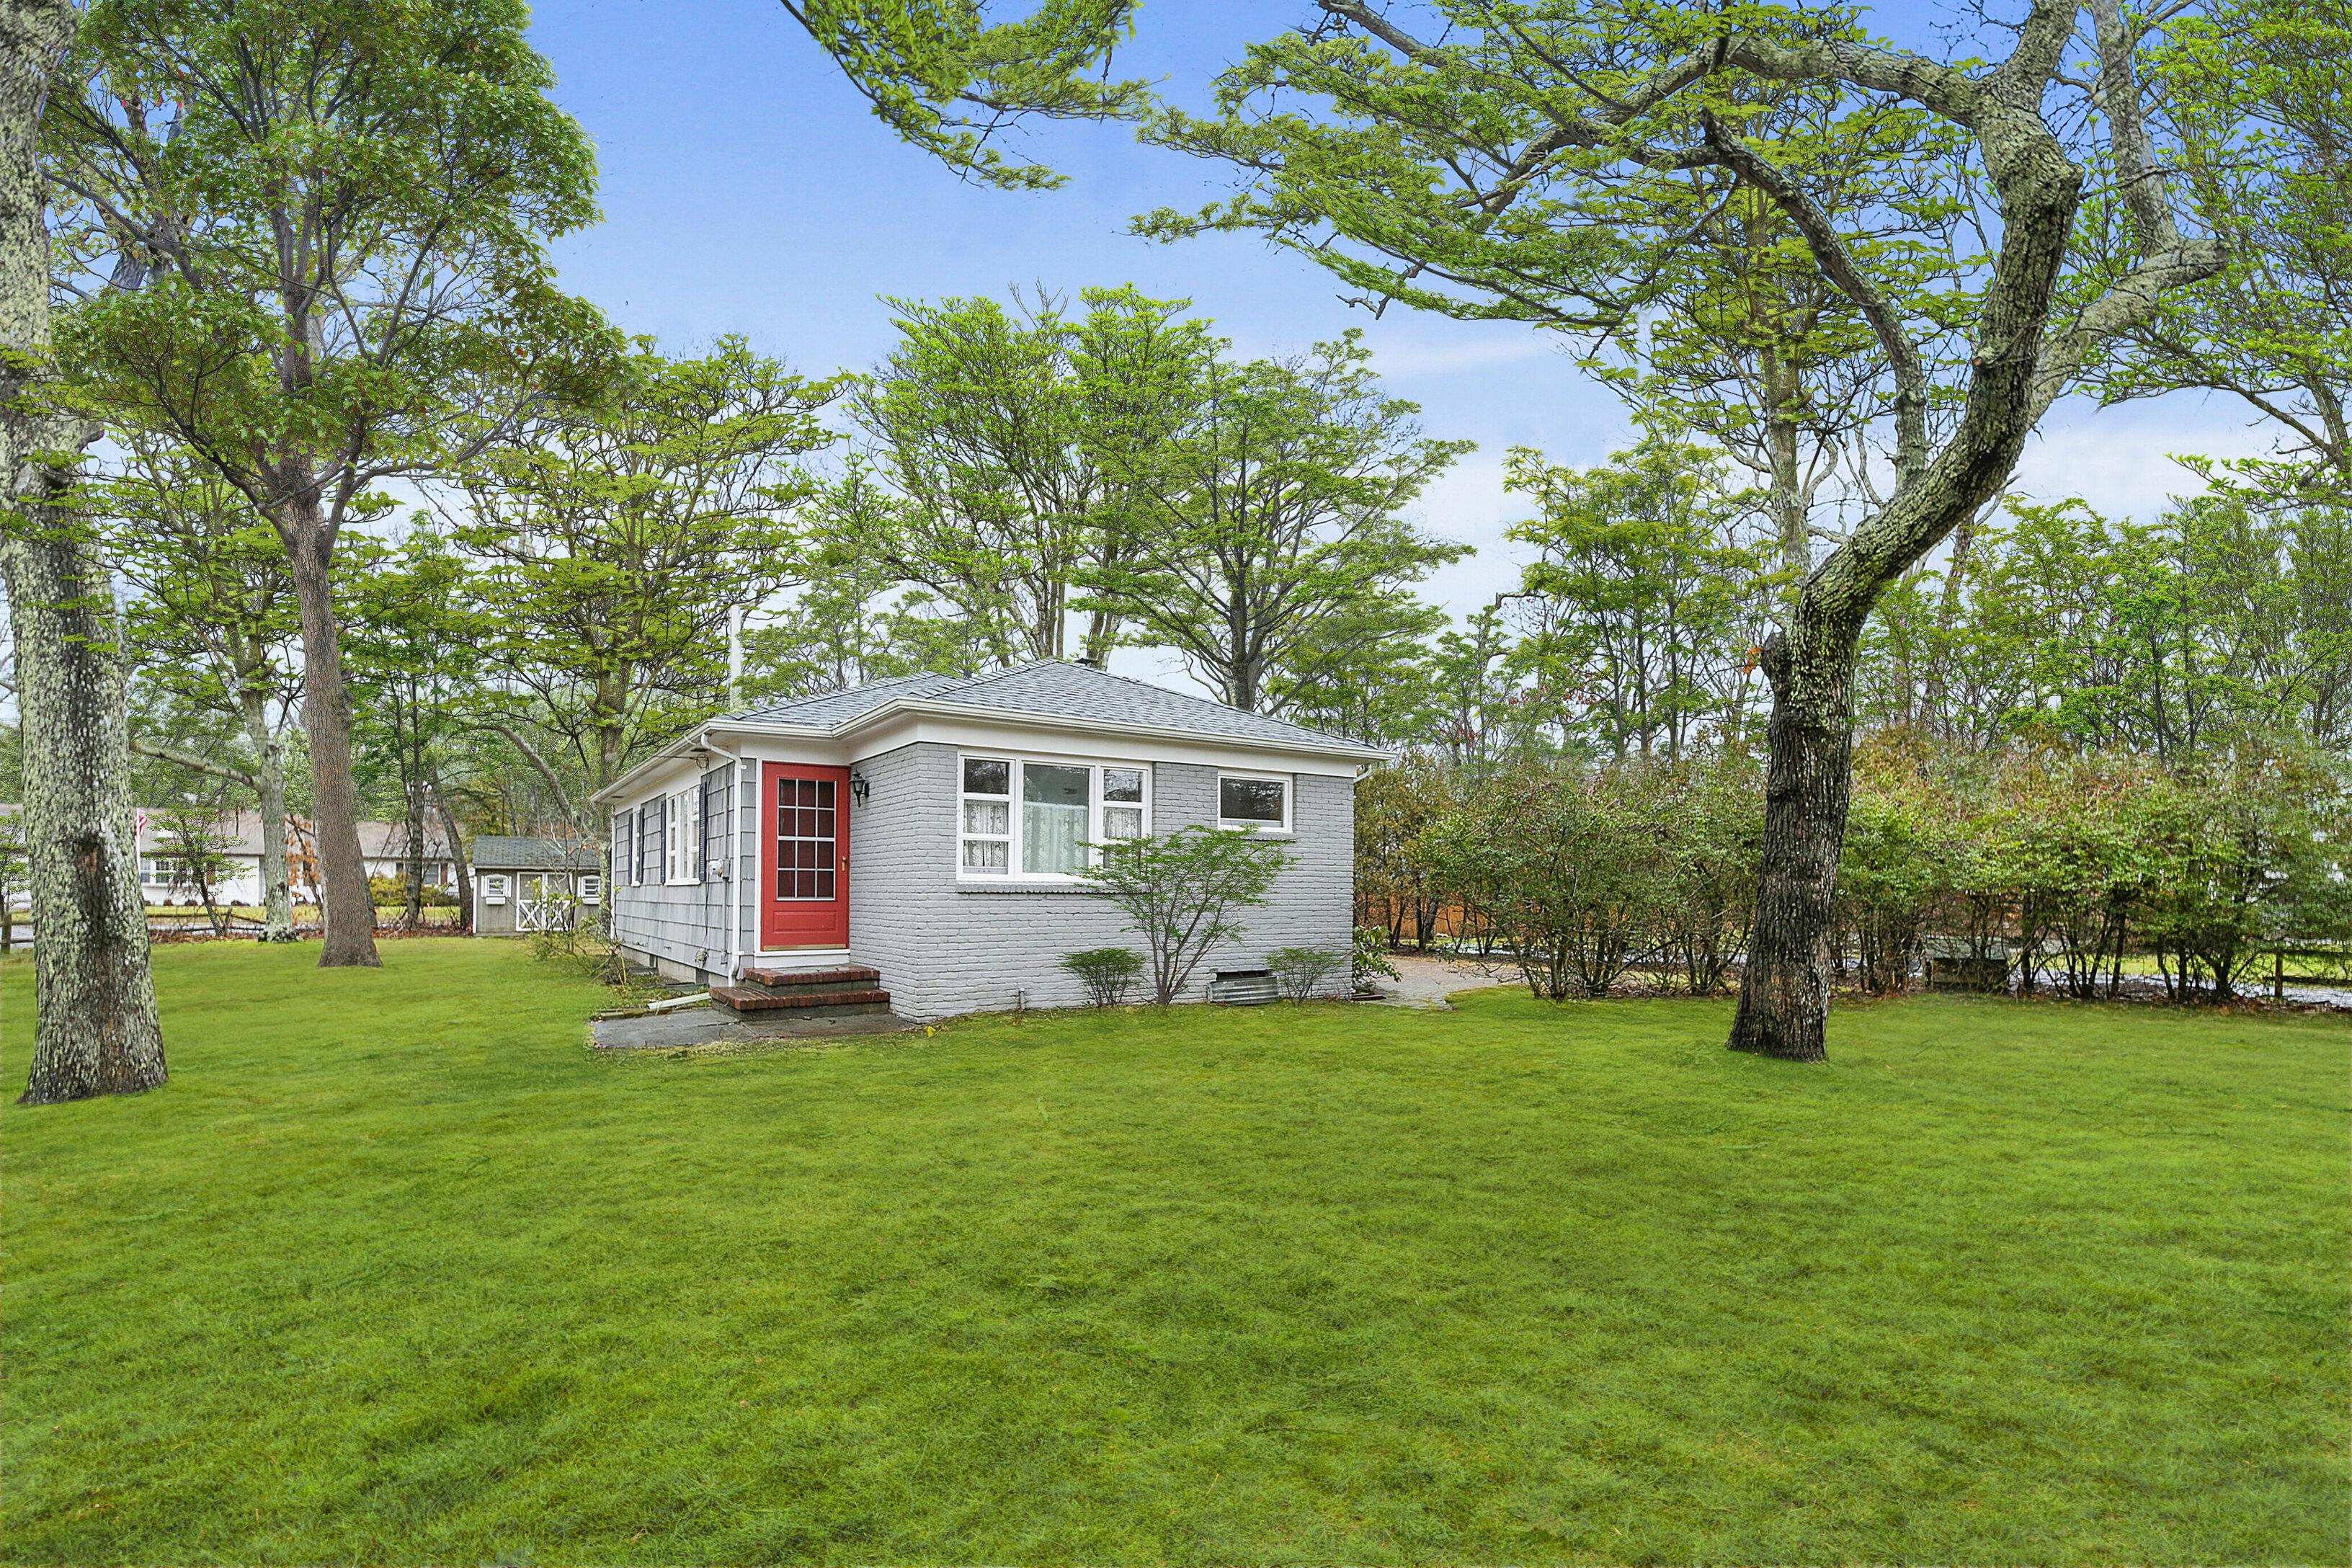 21 Shinnecock Ln - Hampton Bays, New York